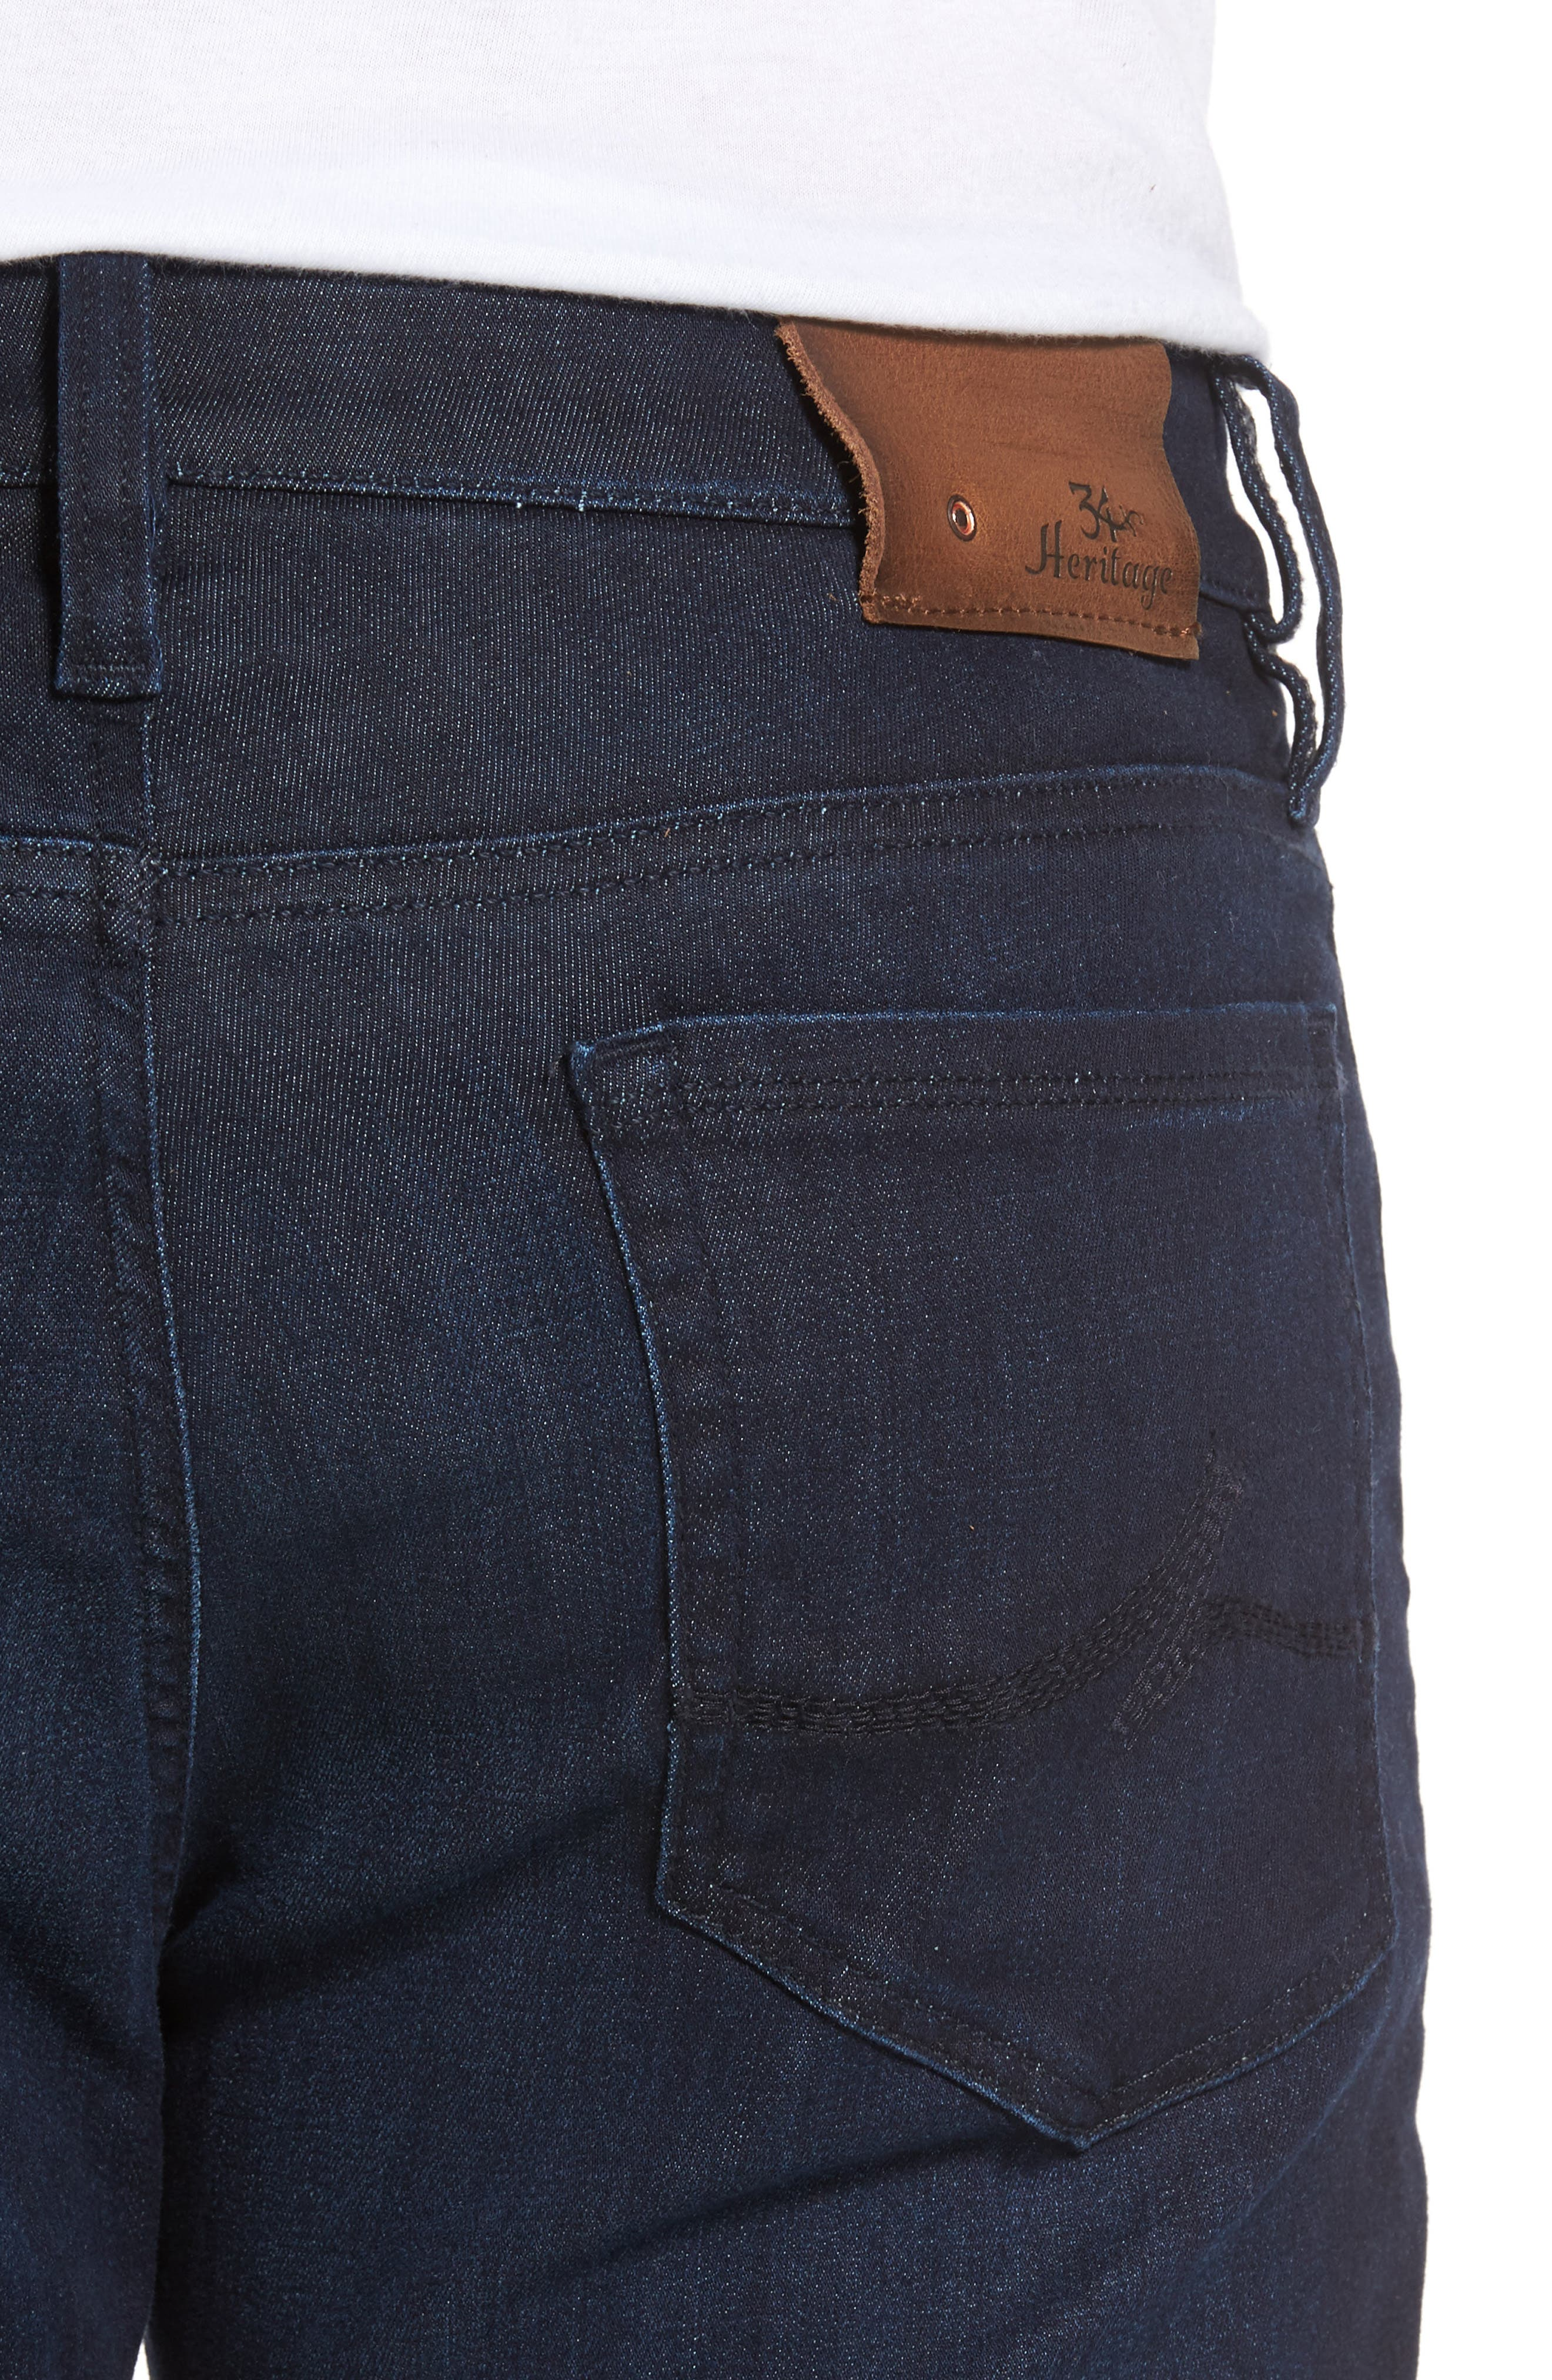 Alternate Image 4  - 34 Heritage Courage Straight Leg Jeans (Dark Rome)